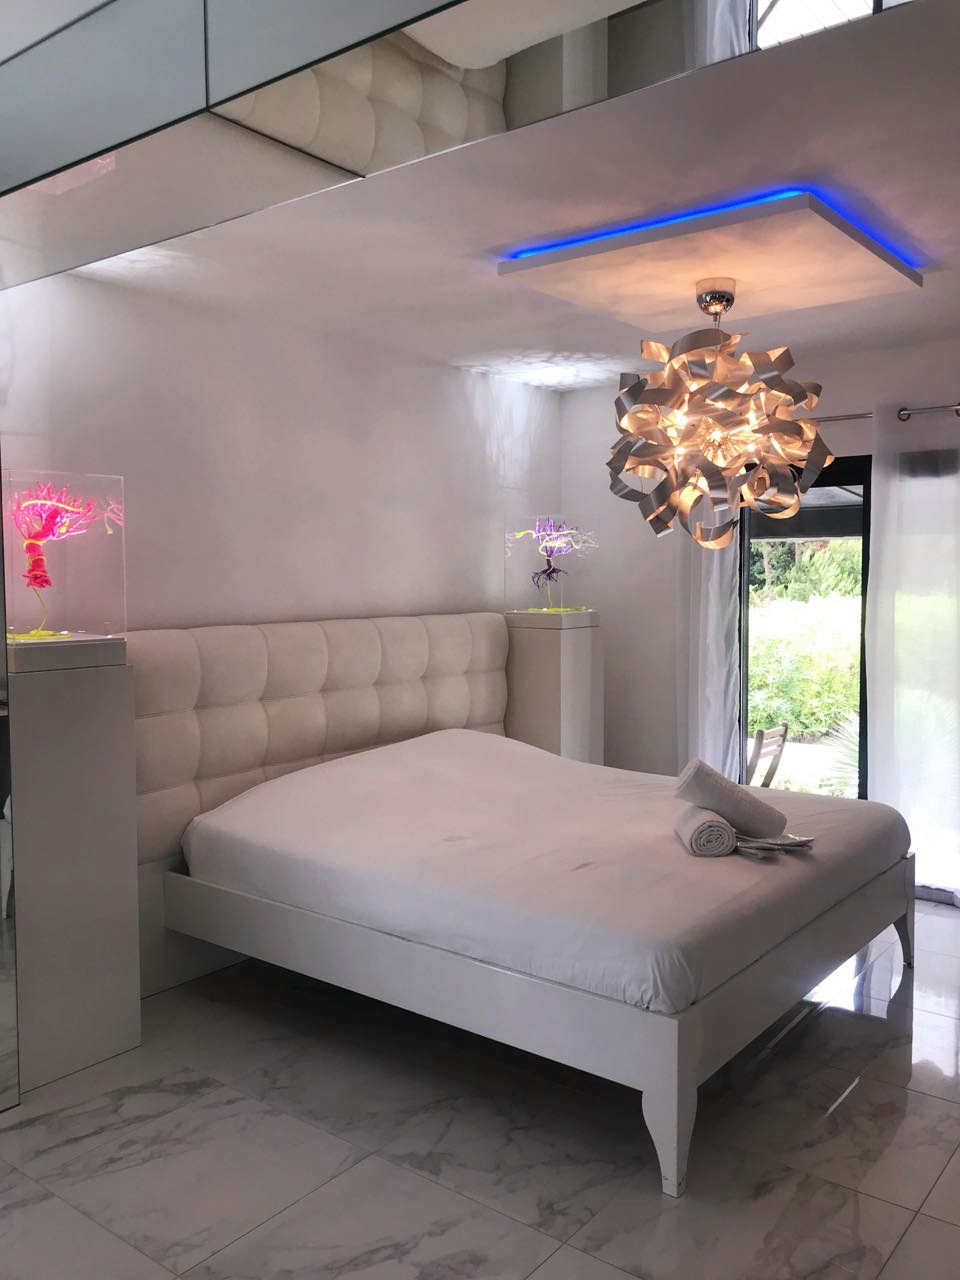 Levitation Room